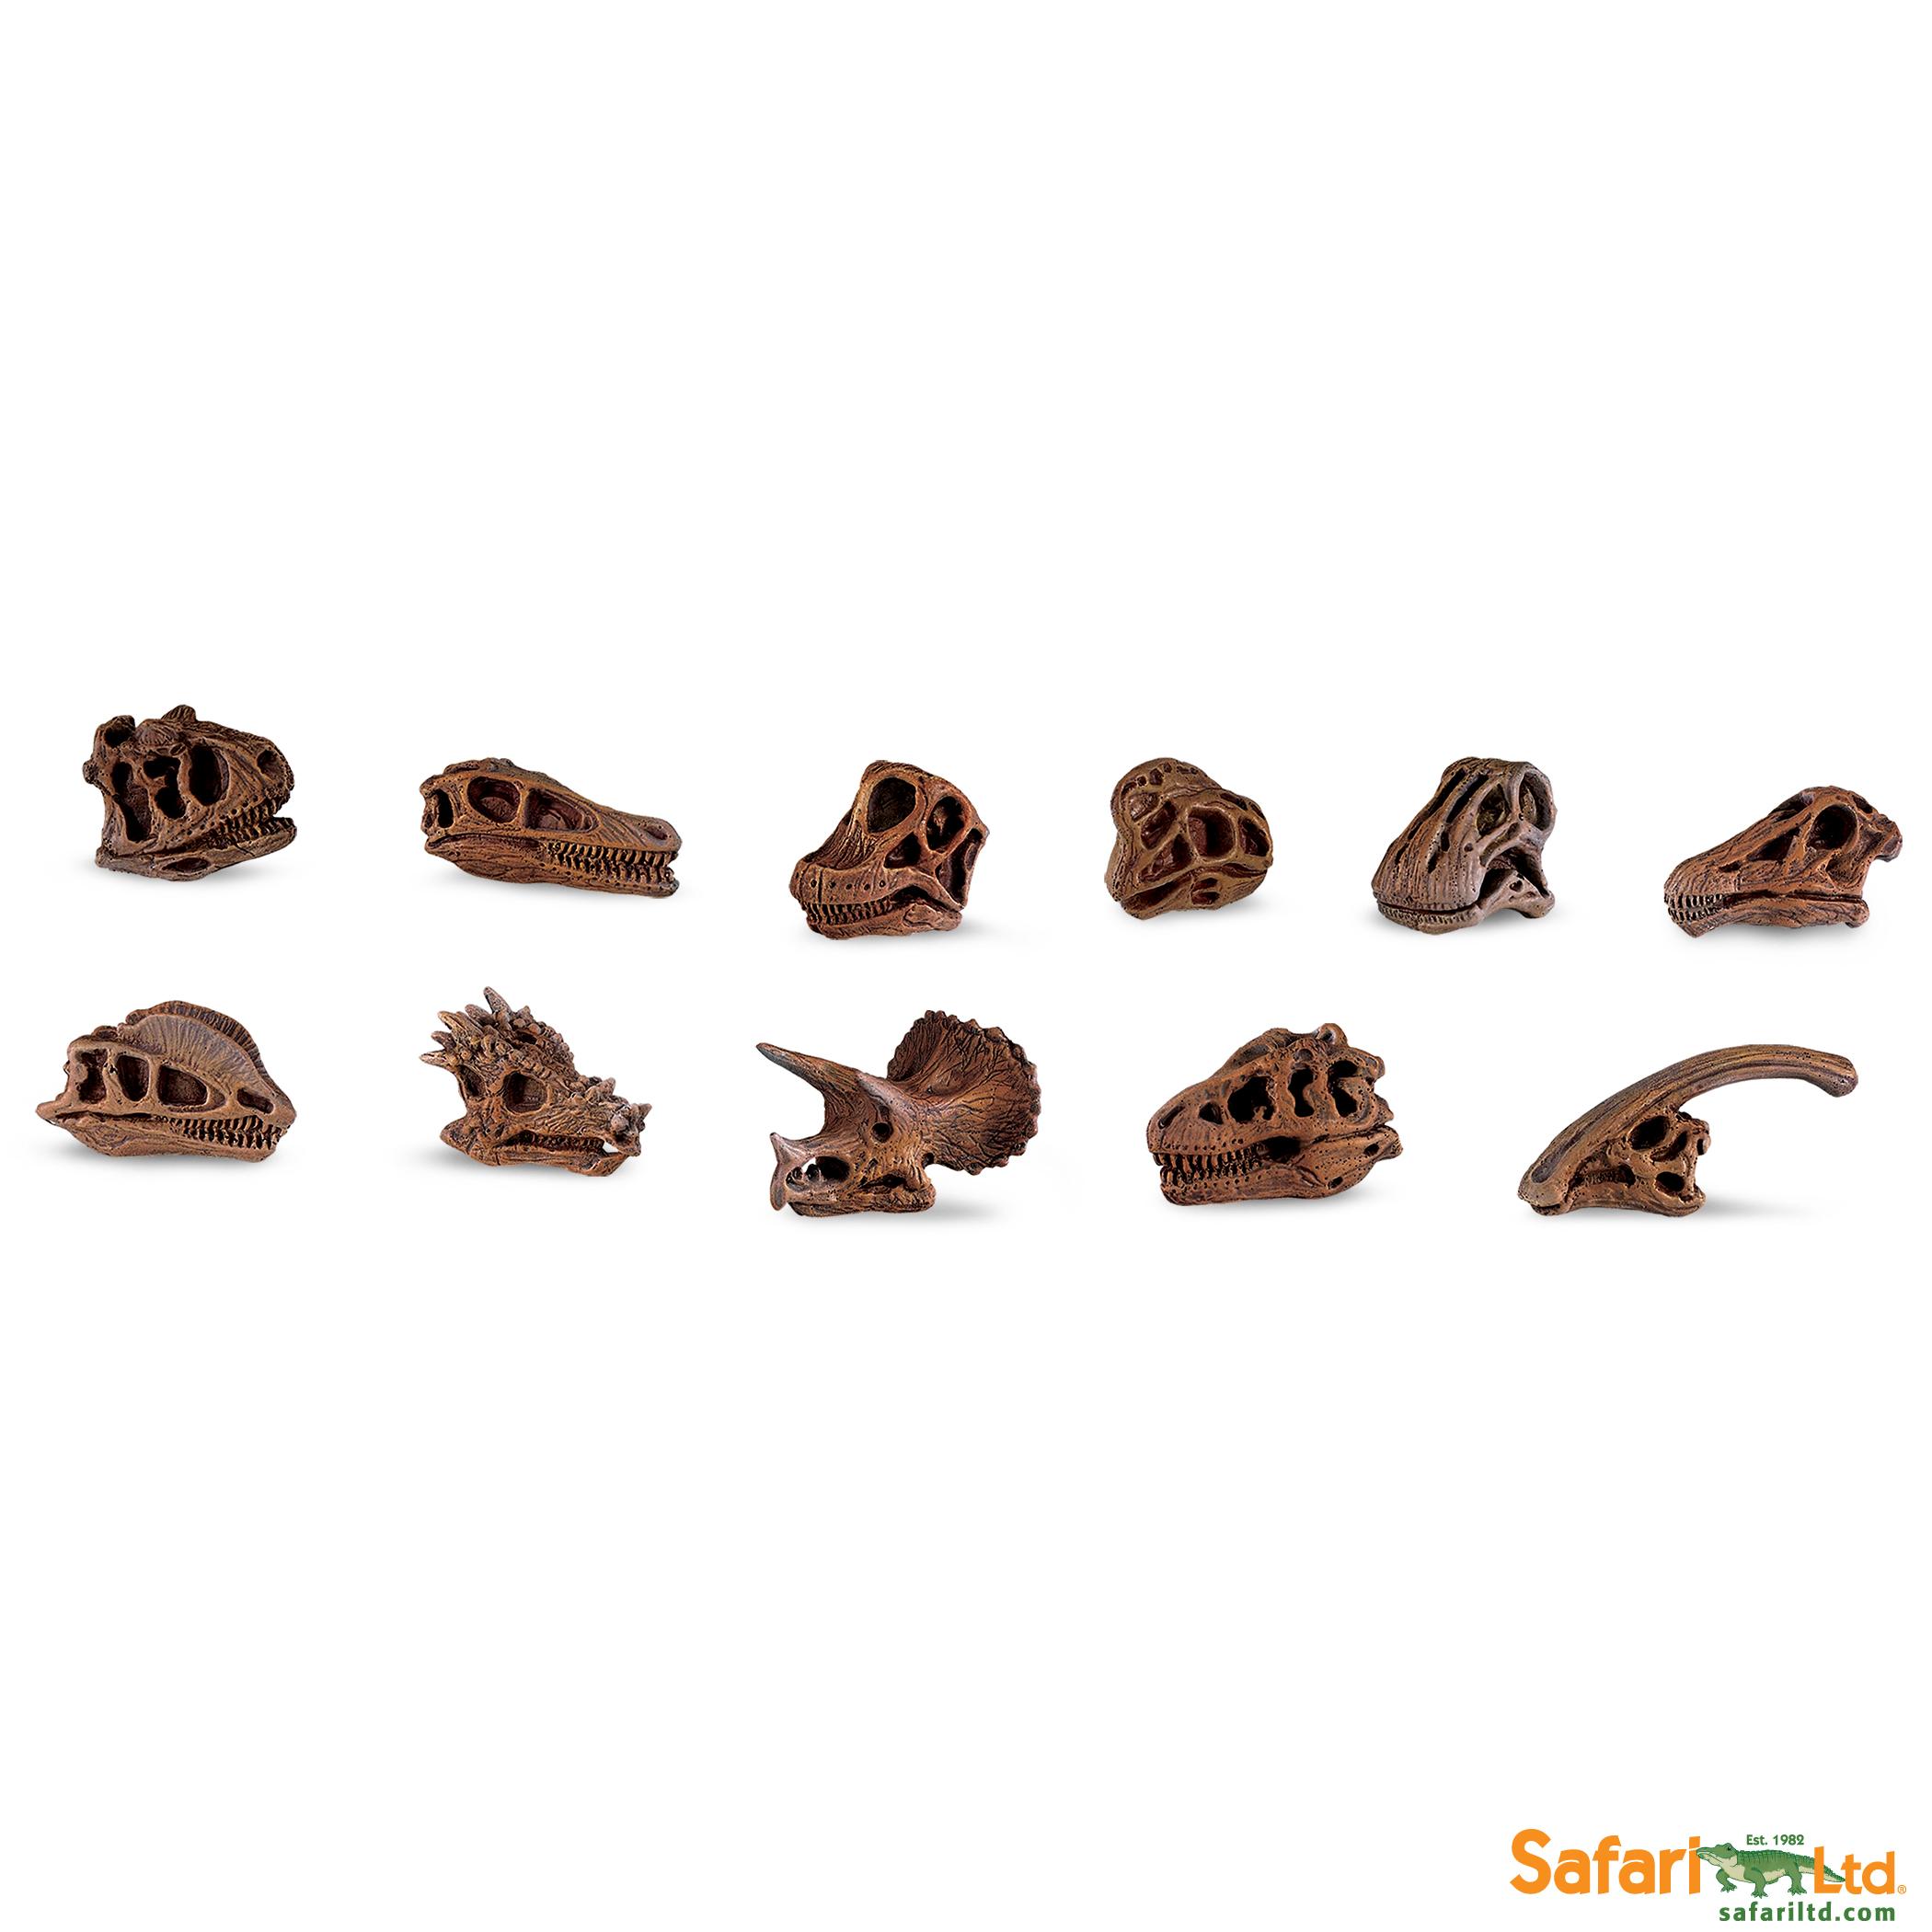 Safari Ltd - Tuba - Lebky dinosaurů